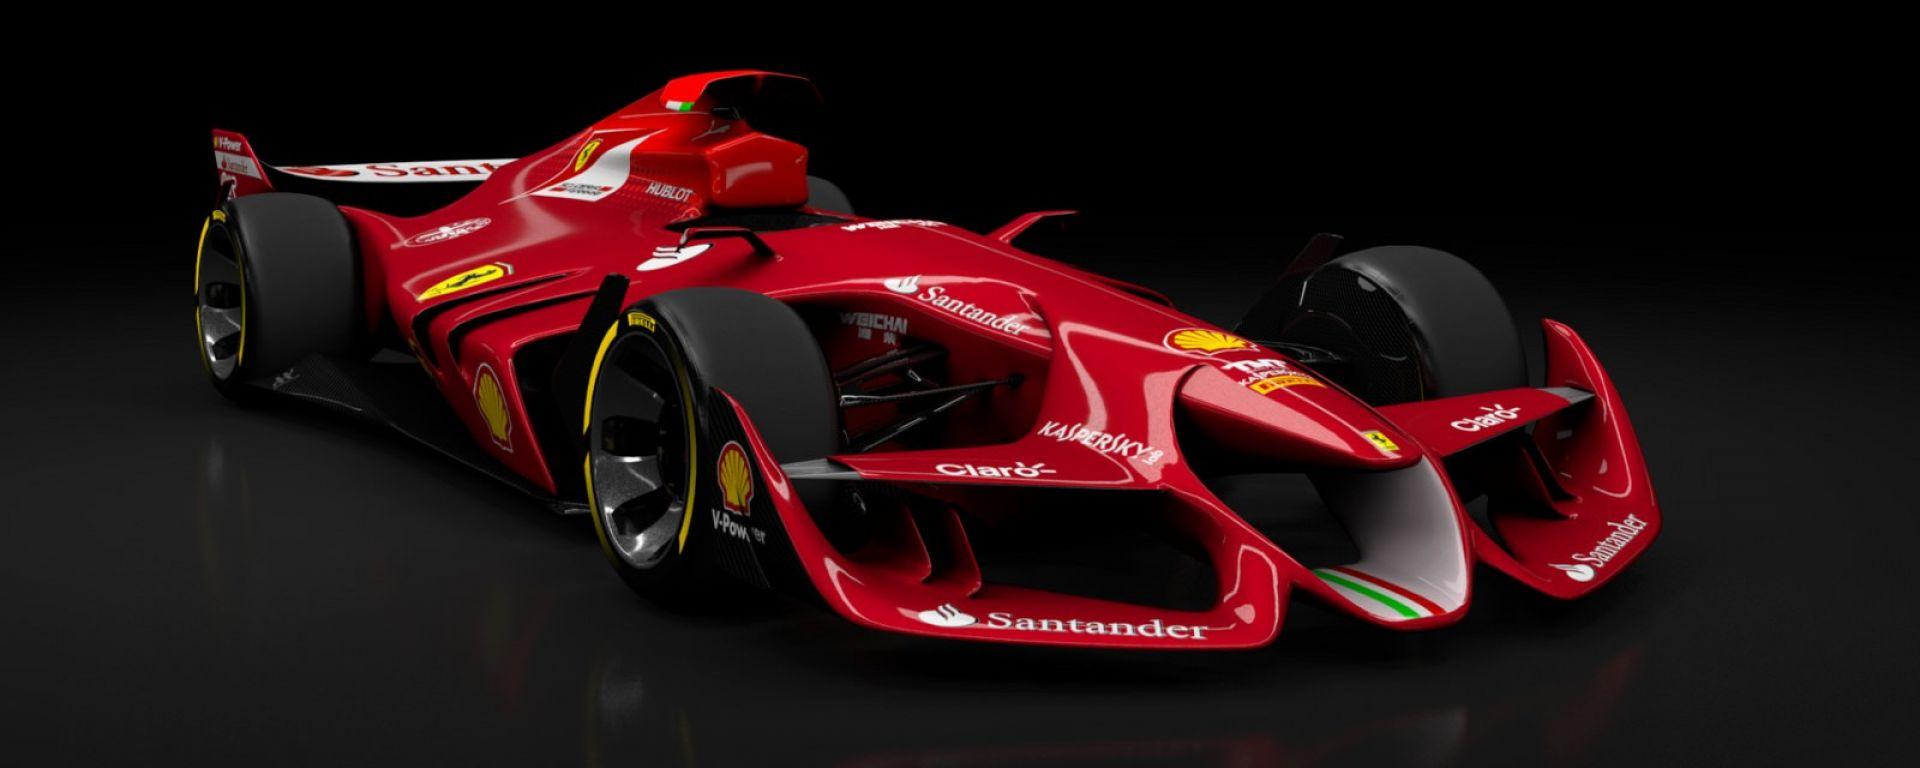 Ferrari - Concept fan made